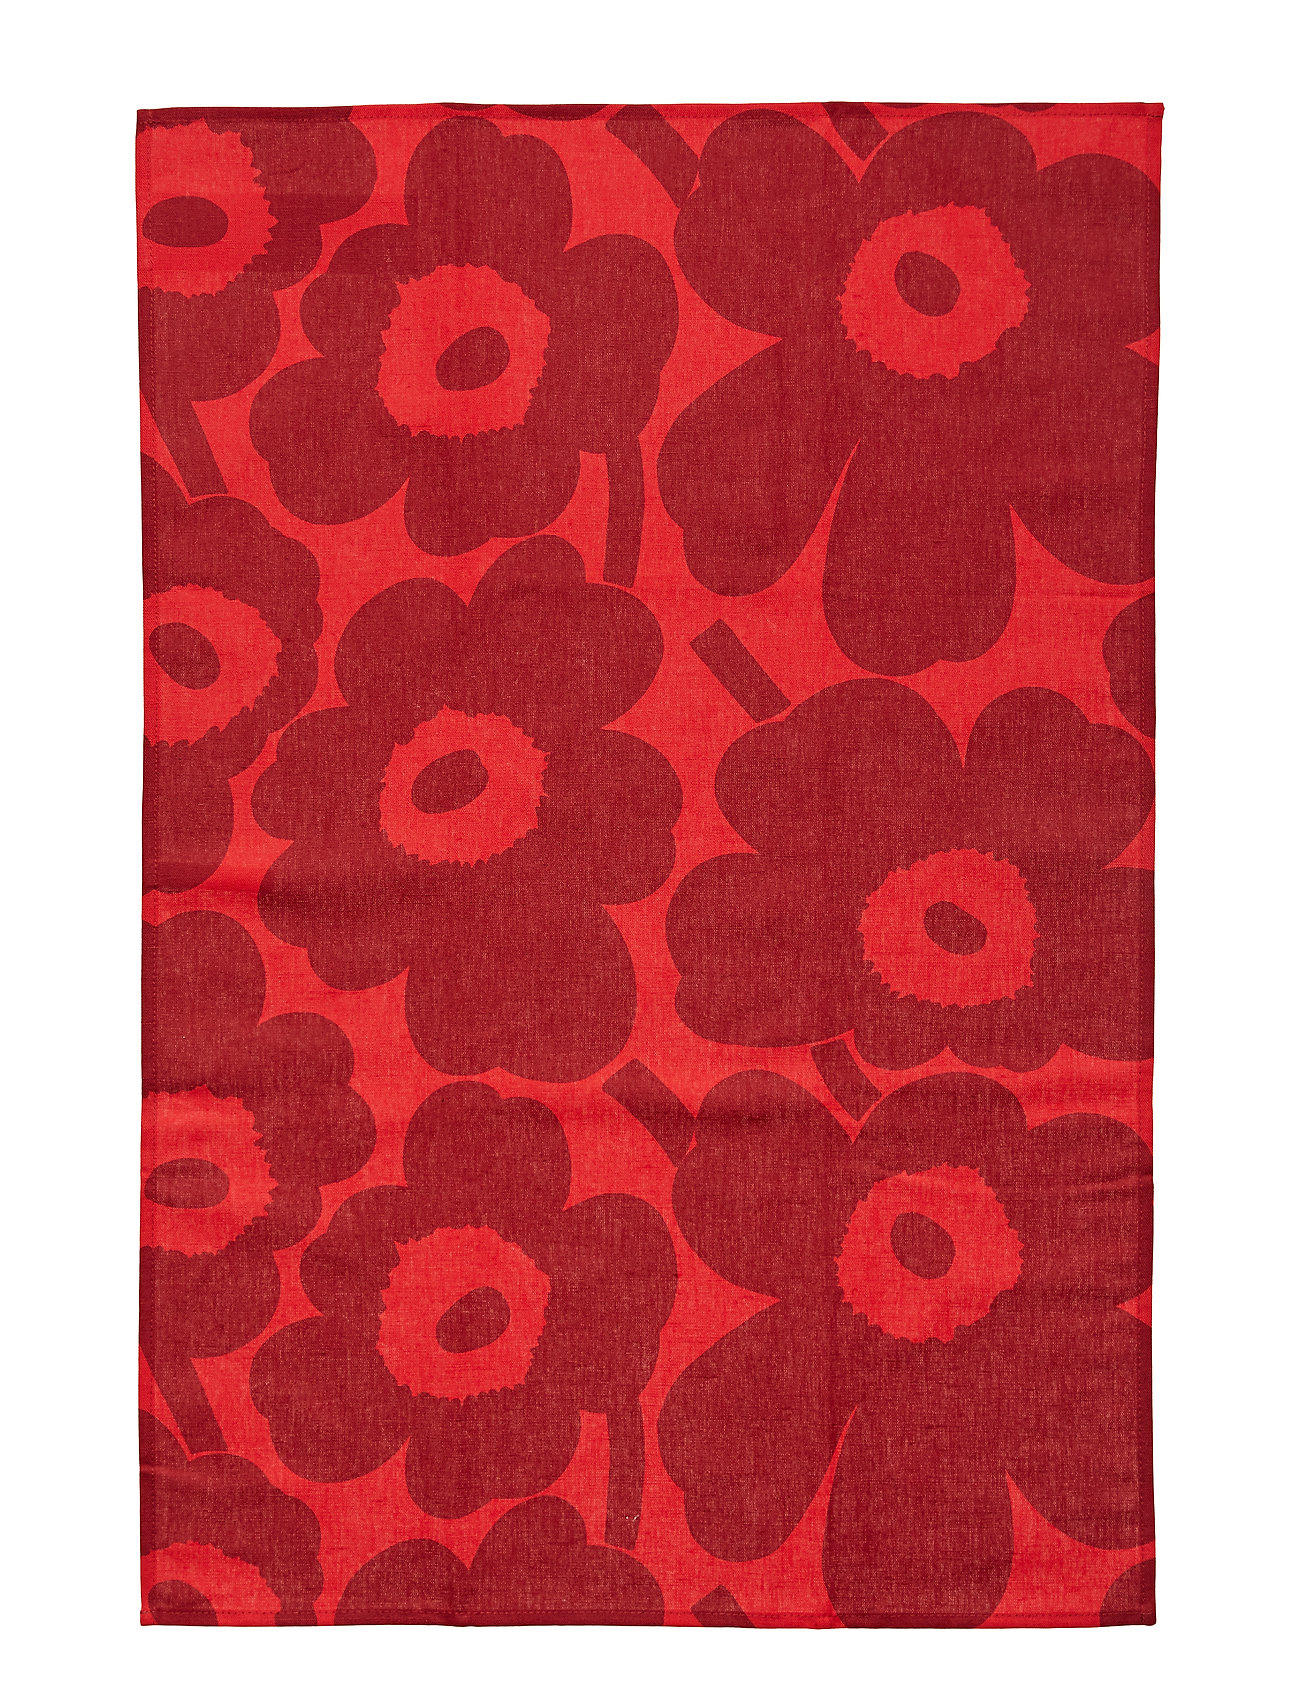 Marimekko Home P.UNIKKO KITCHEN TOWEL 2 PCS - RED, DARK RED